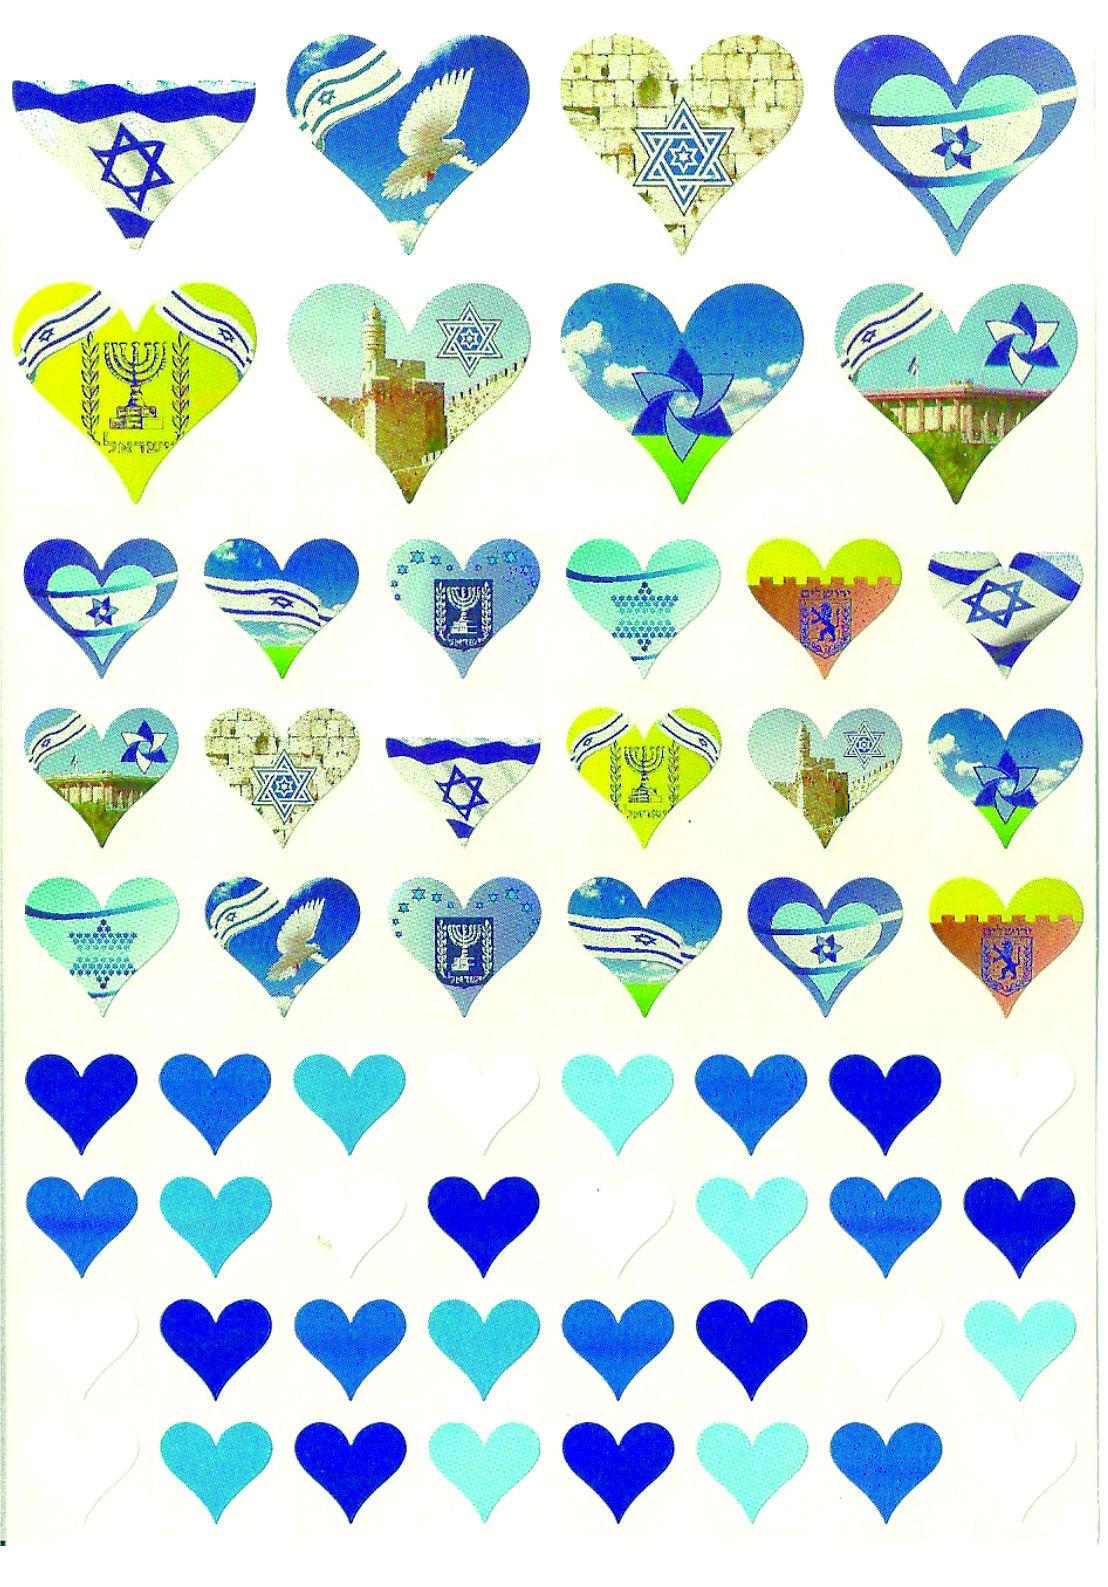 Judaica Atzmaut Kotel Menorah Flag 500 Stickers Children Teaching Aid Israel